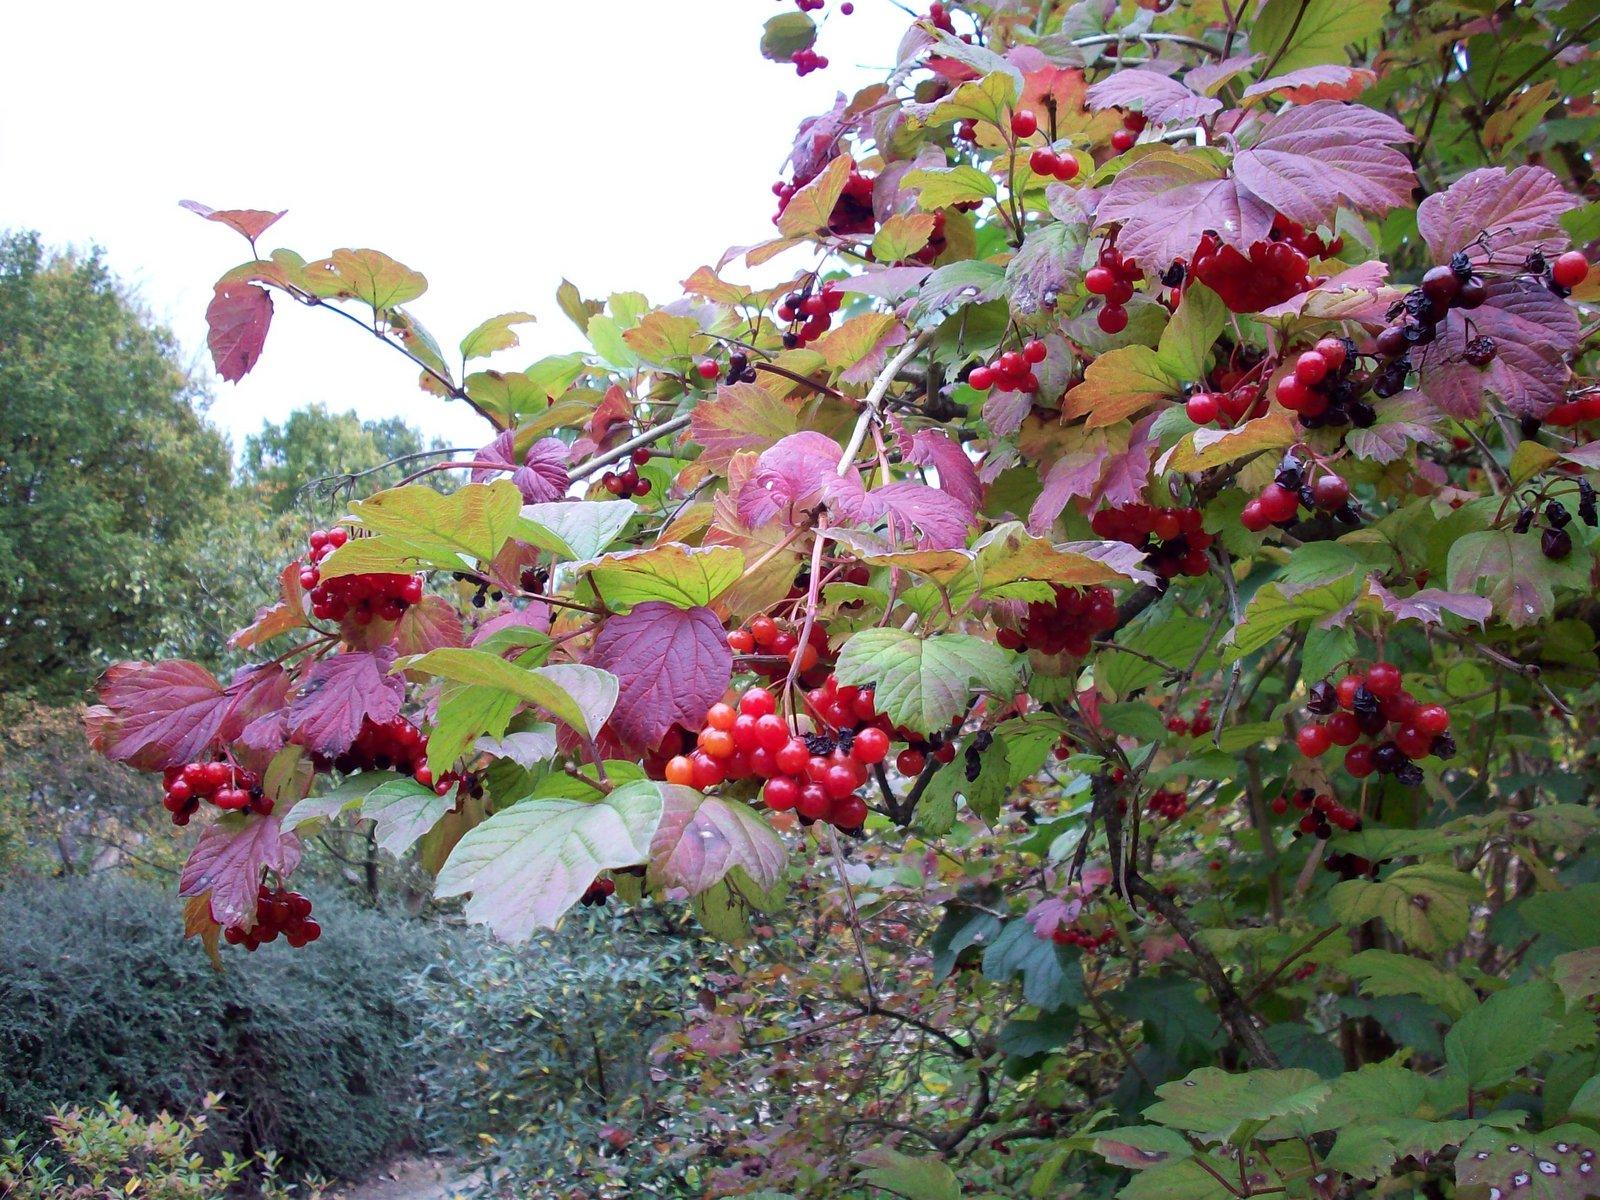 guelder rose 'Notcutt's Variety'